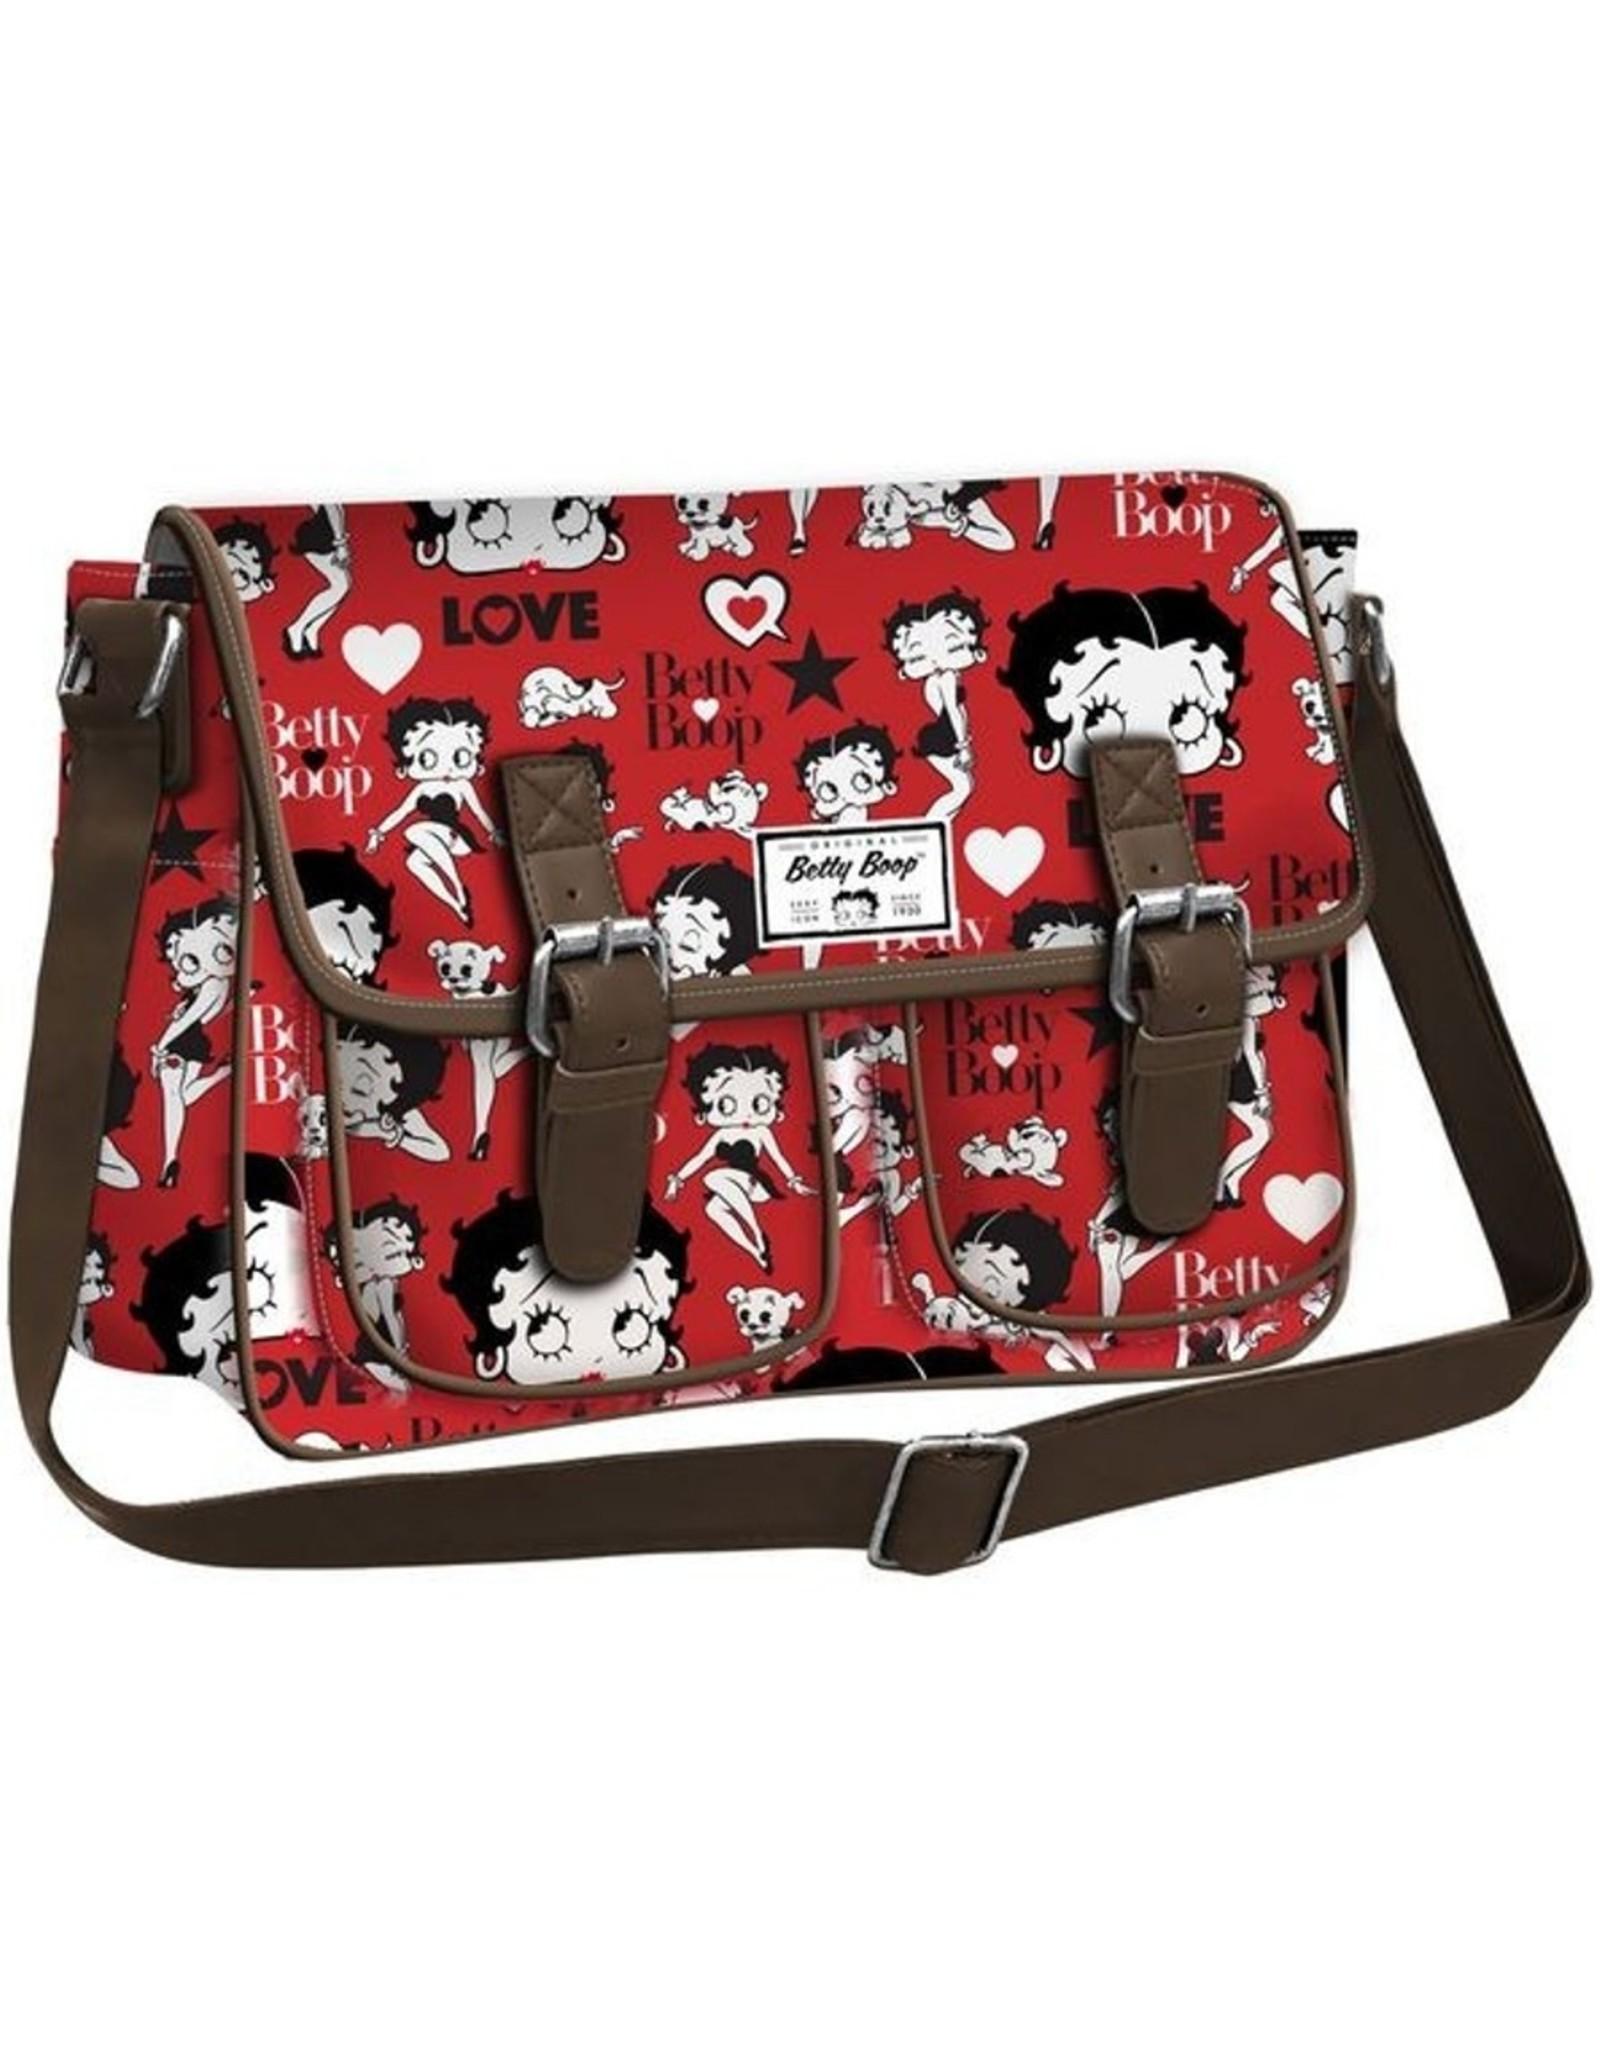 Betty Boop Betty Boop bags - Betty Boop messenger bag red